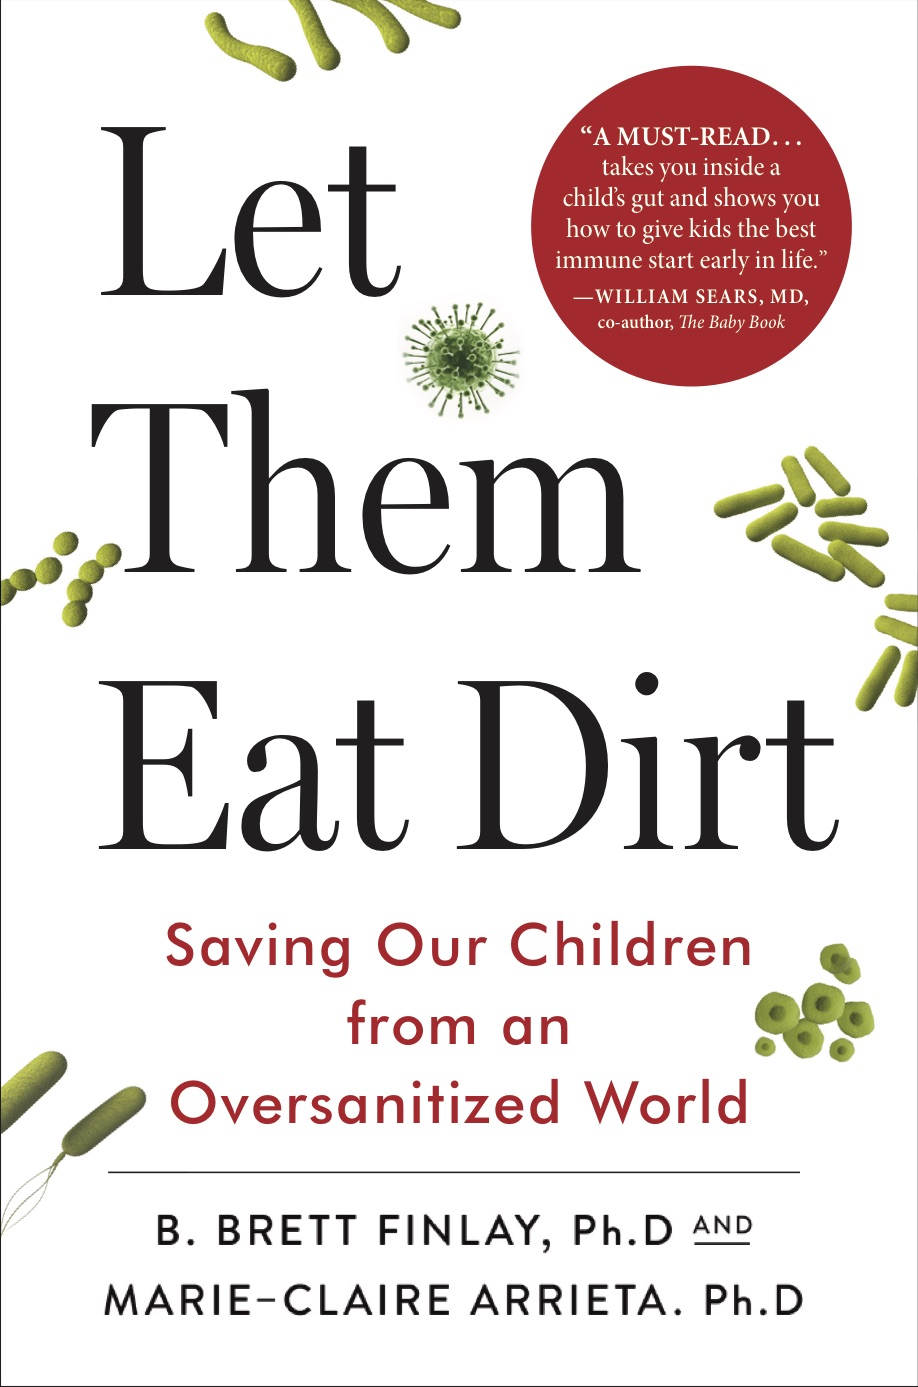 Finley_Arrieta_Let-Them-Eat-Dirt12-copy.jpg